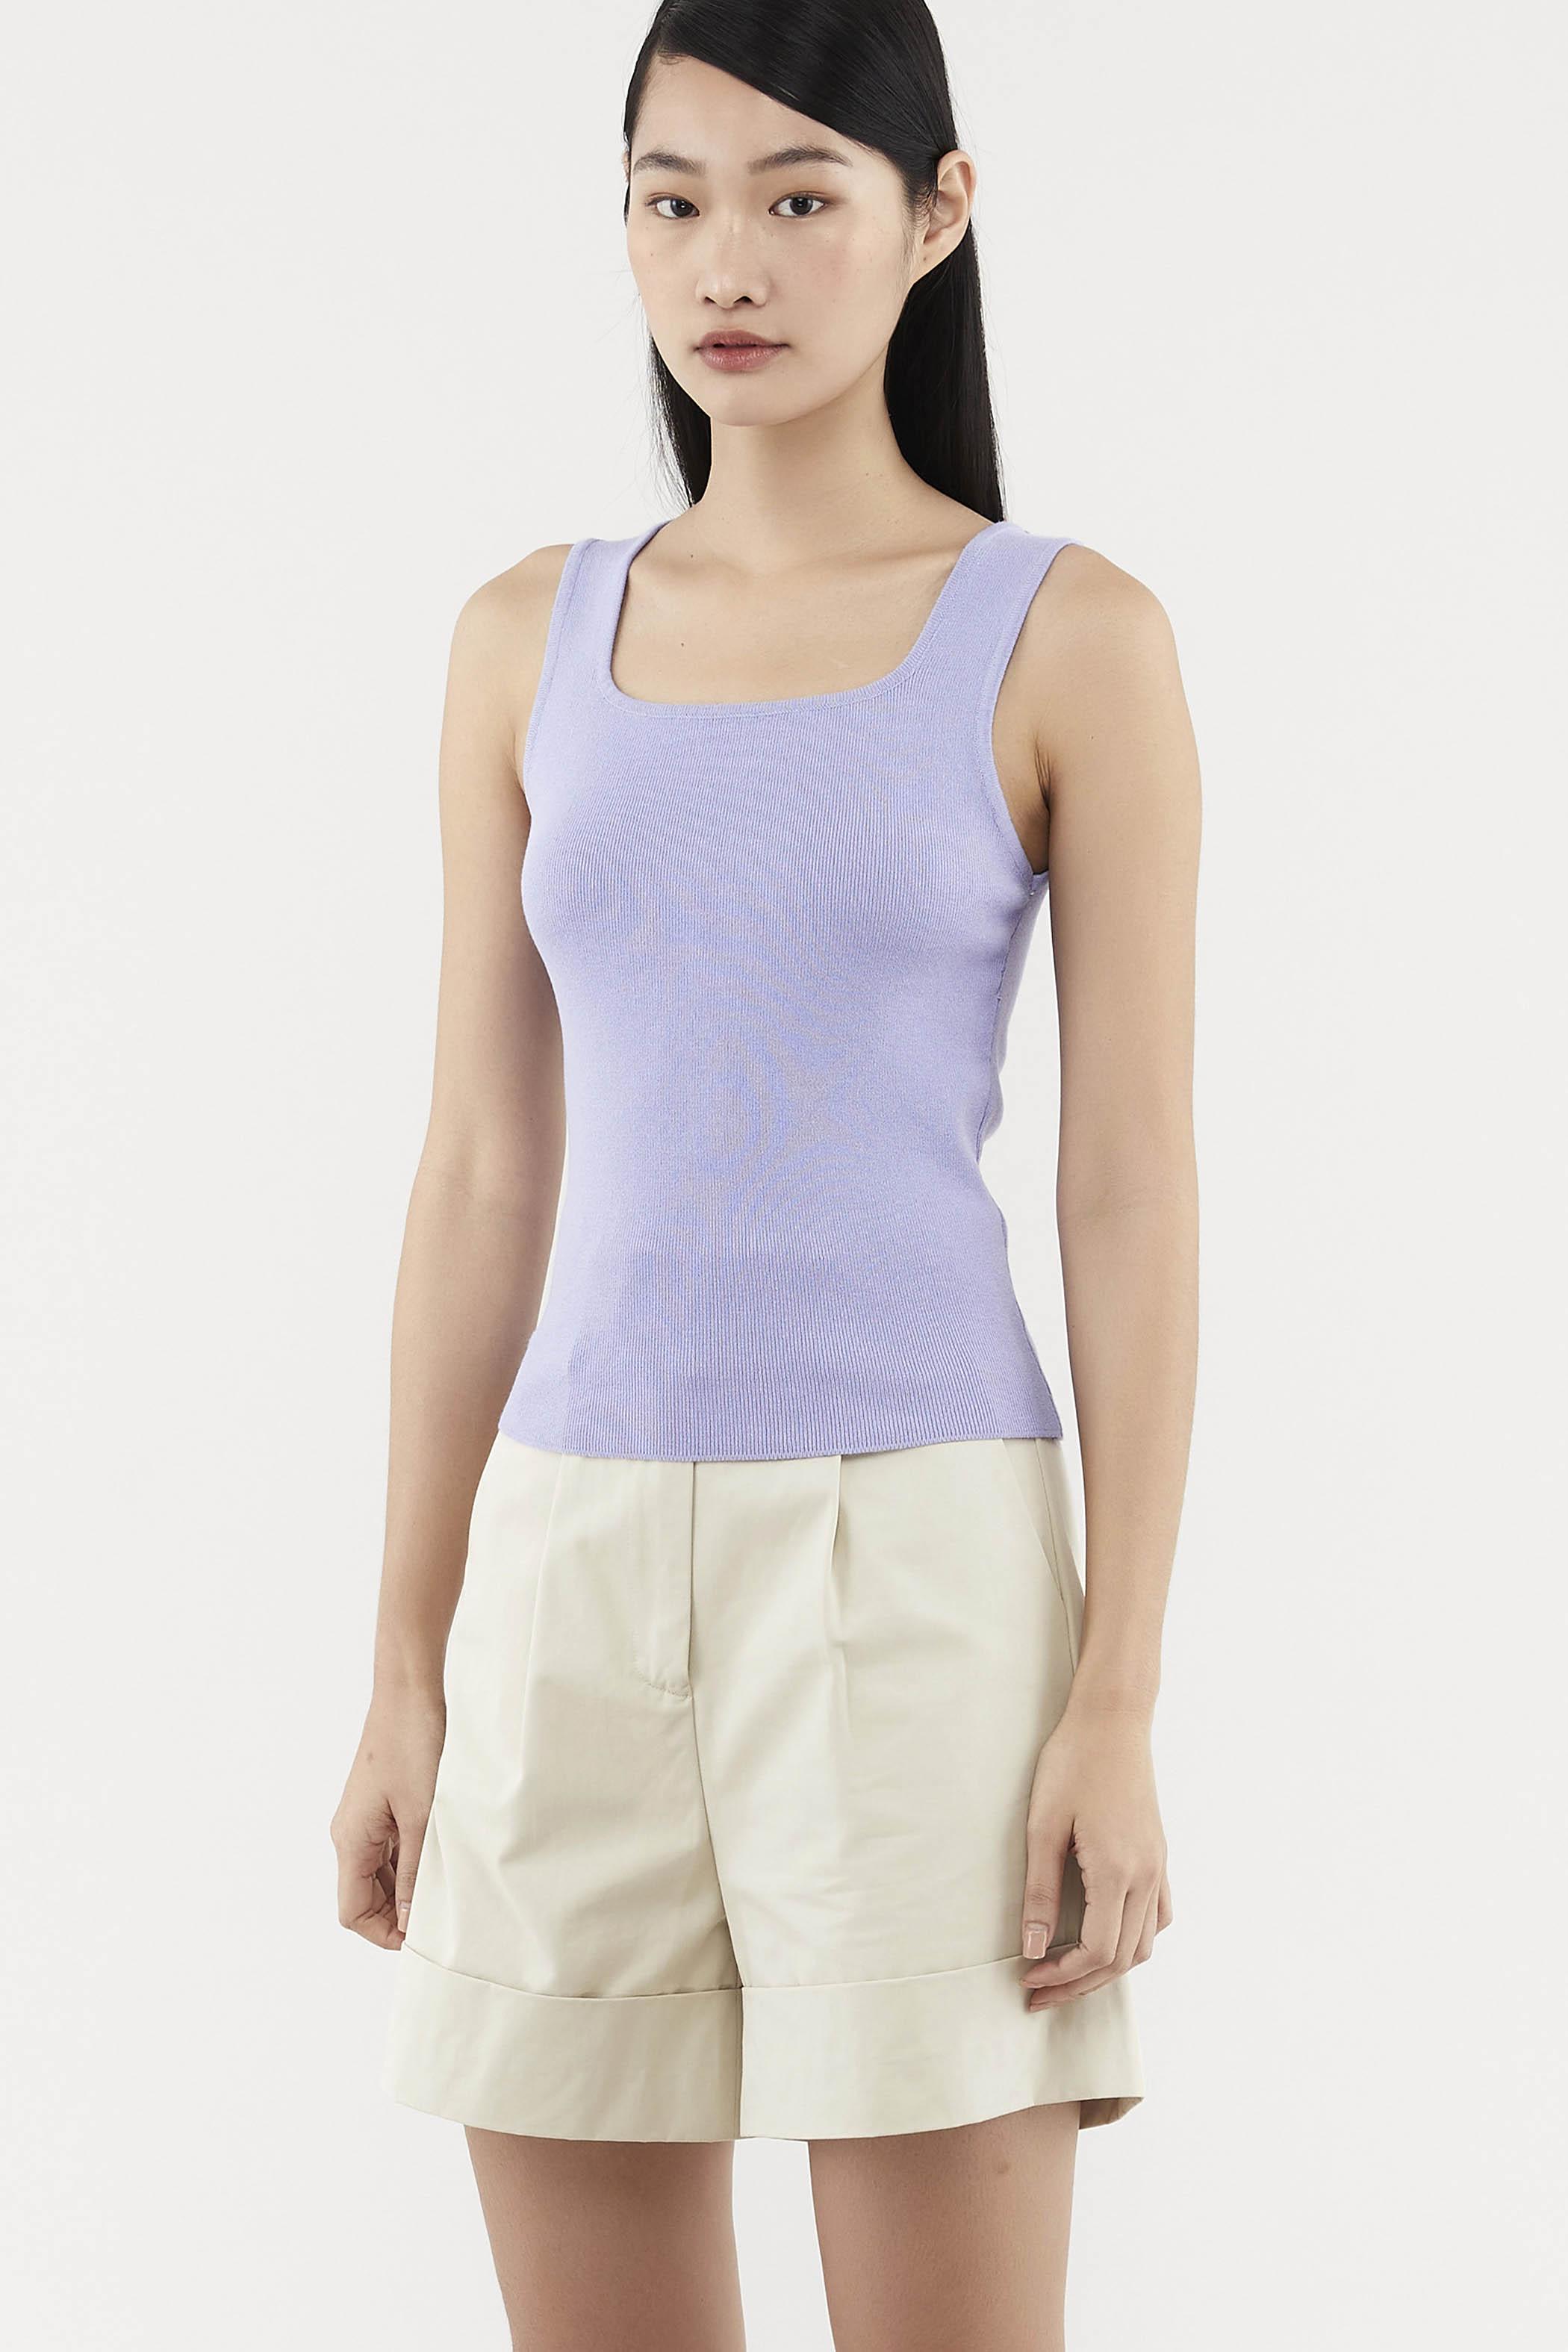 Aspen Square-neck Knit Top